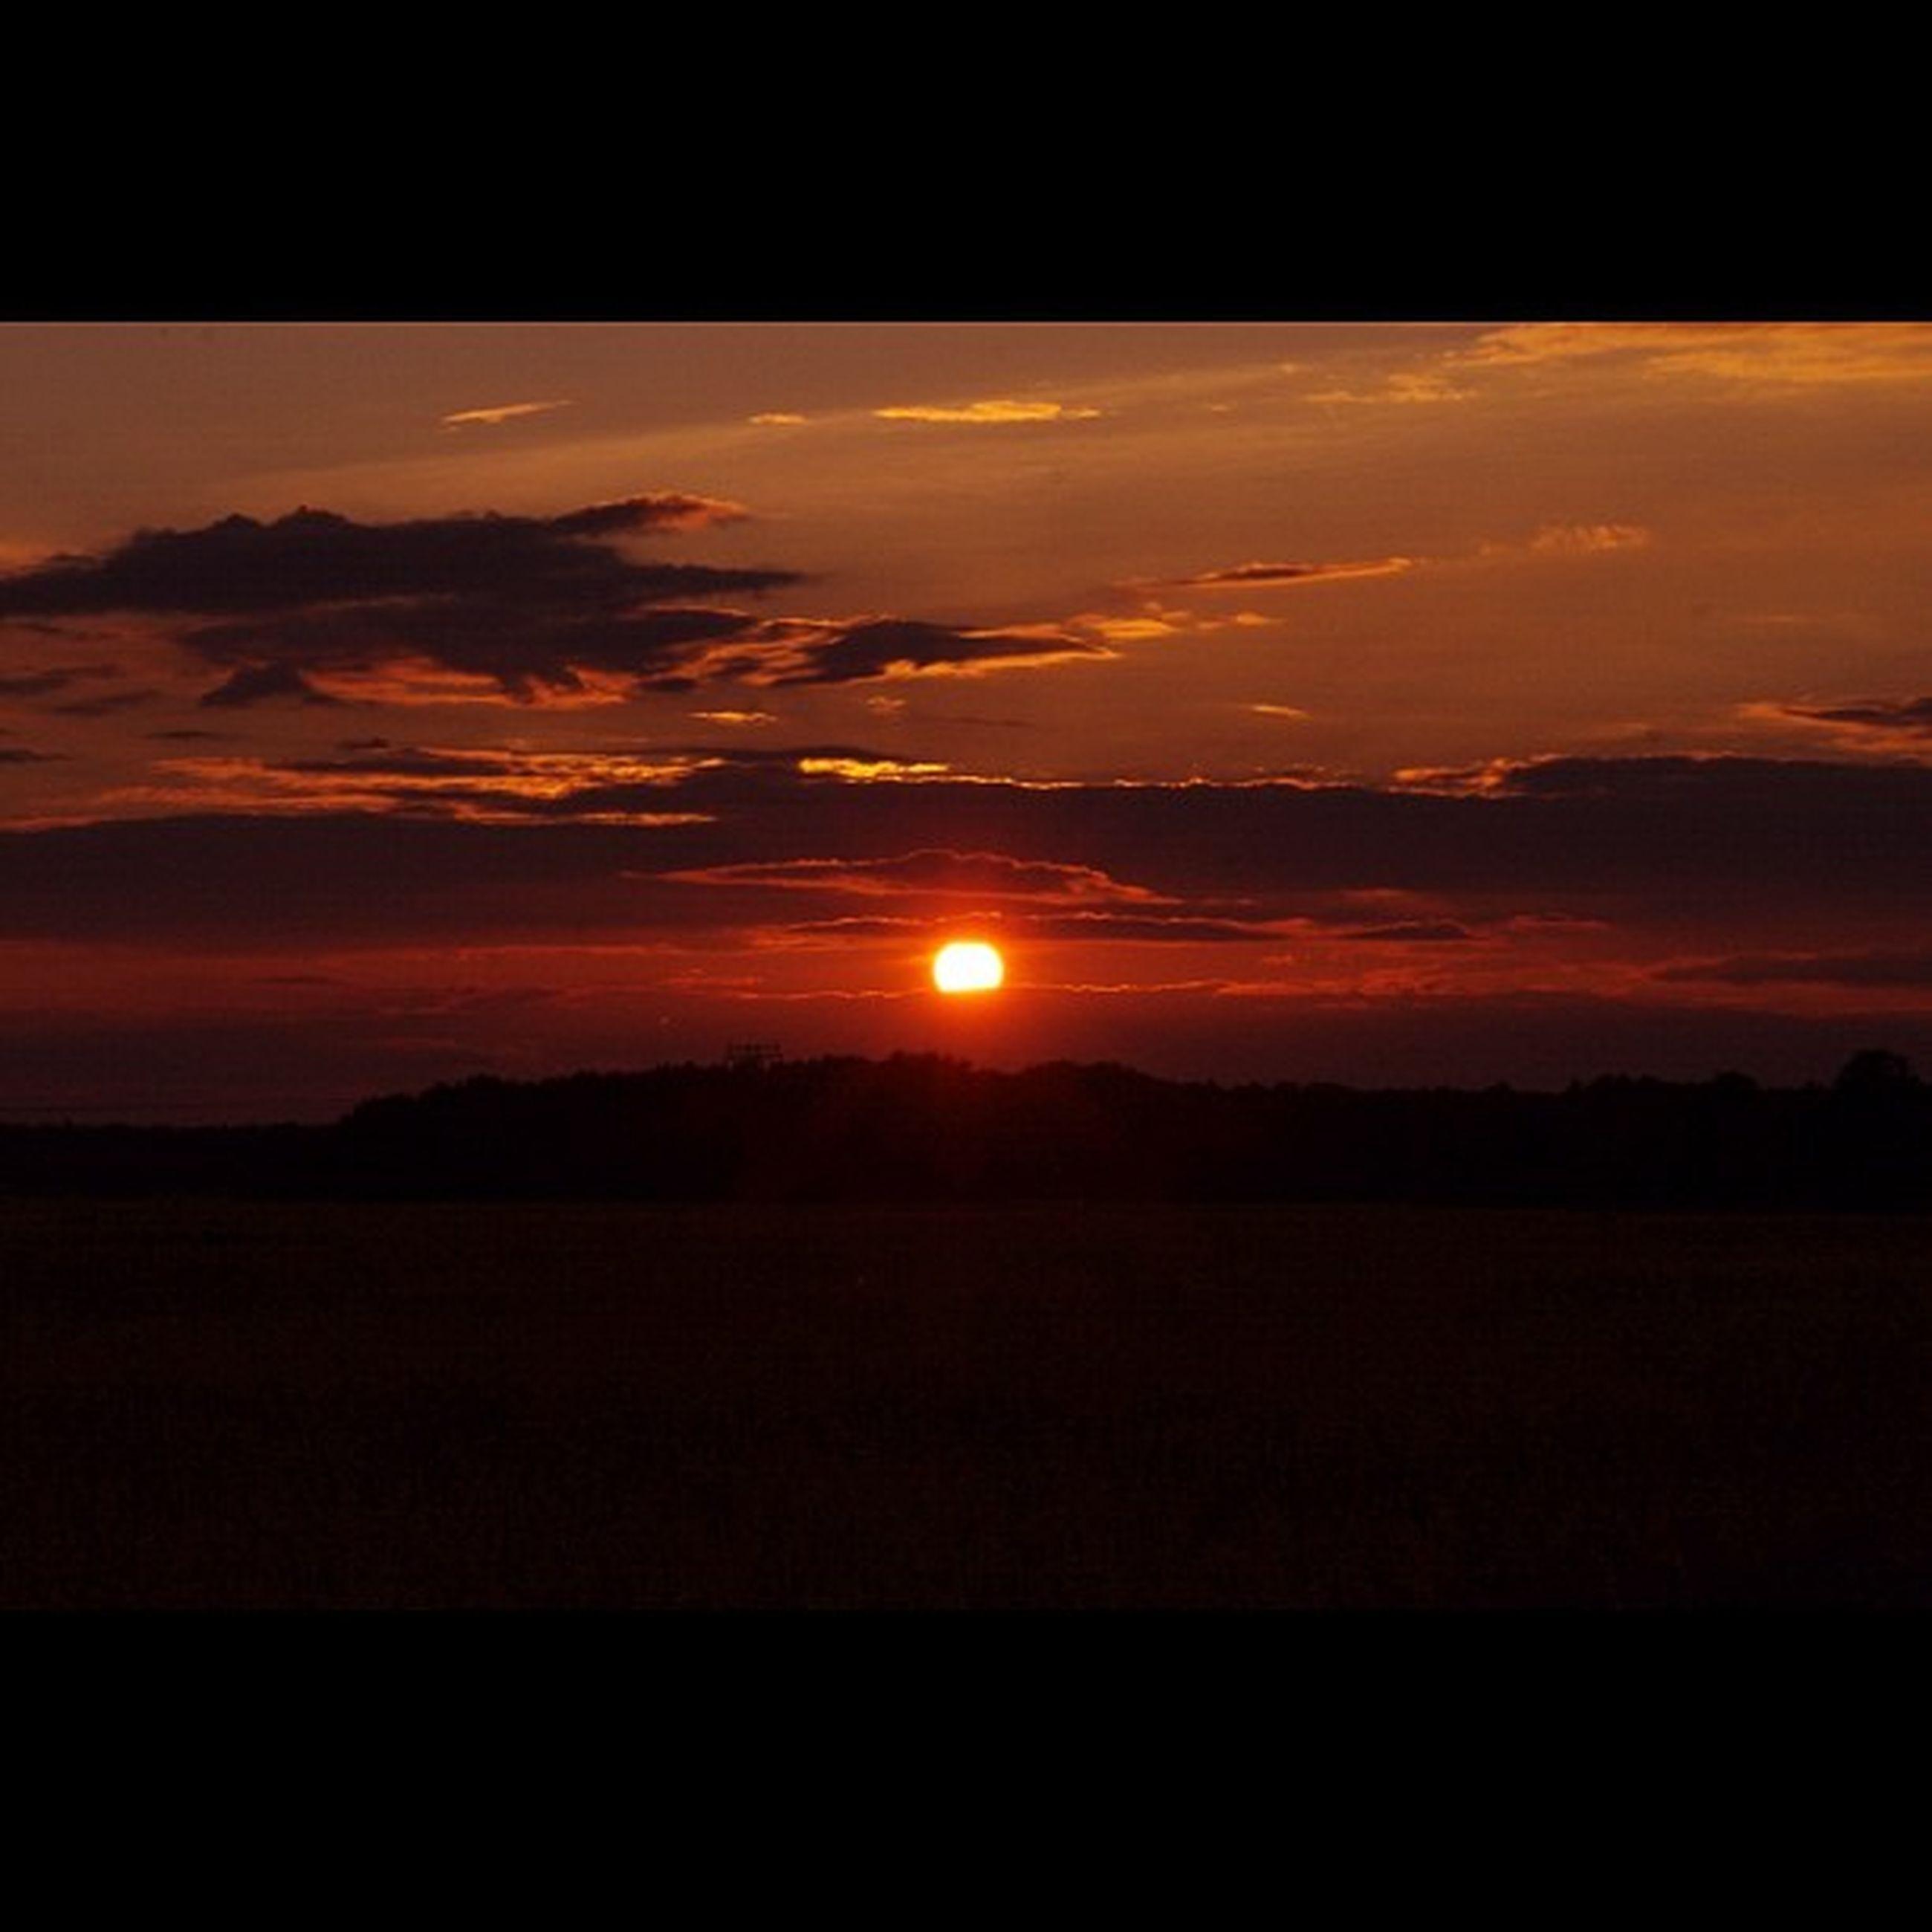 sunset, scenics, silhouette, sky, orange color, tranquil scene, beauty in nature, tranquility, sun, cloud - sky, idyllic, landscape, nature, dramatic sky, cloud, dark, sunlight, moody sky, outdoors, majestic